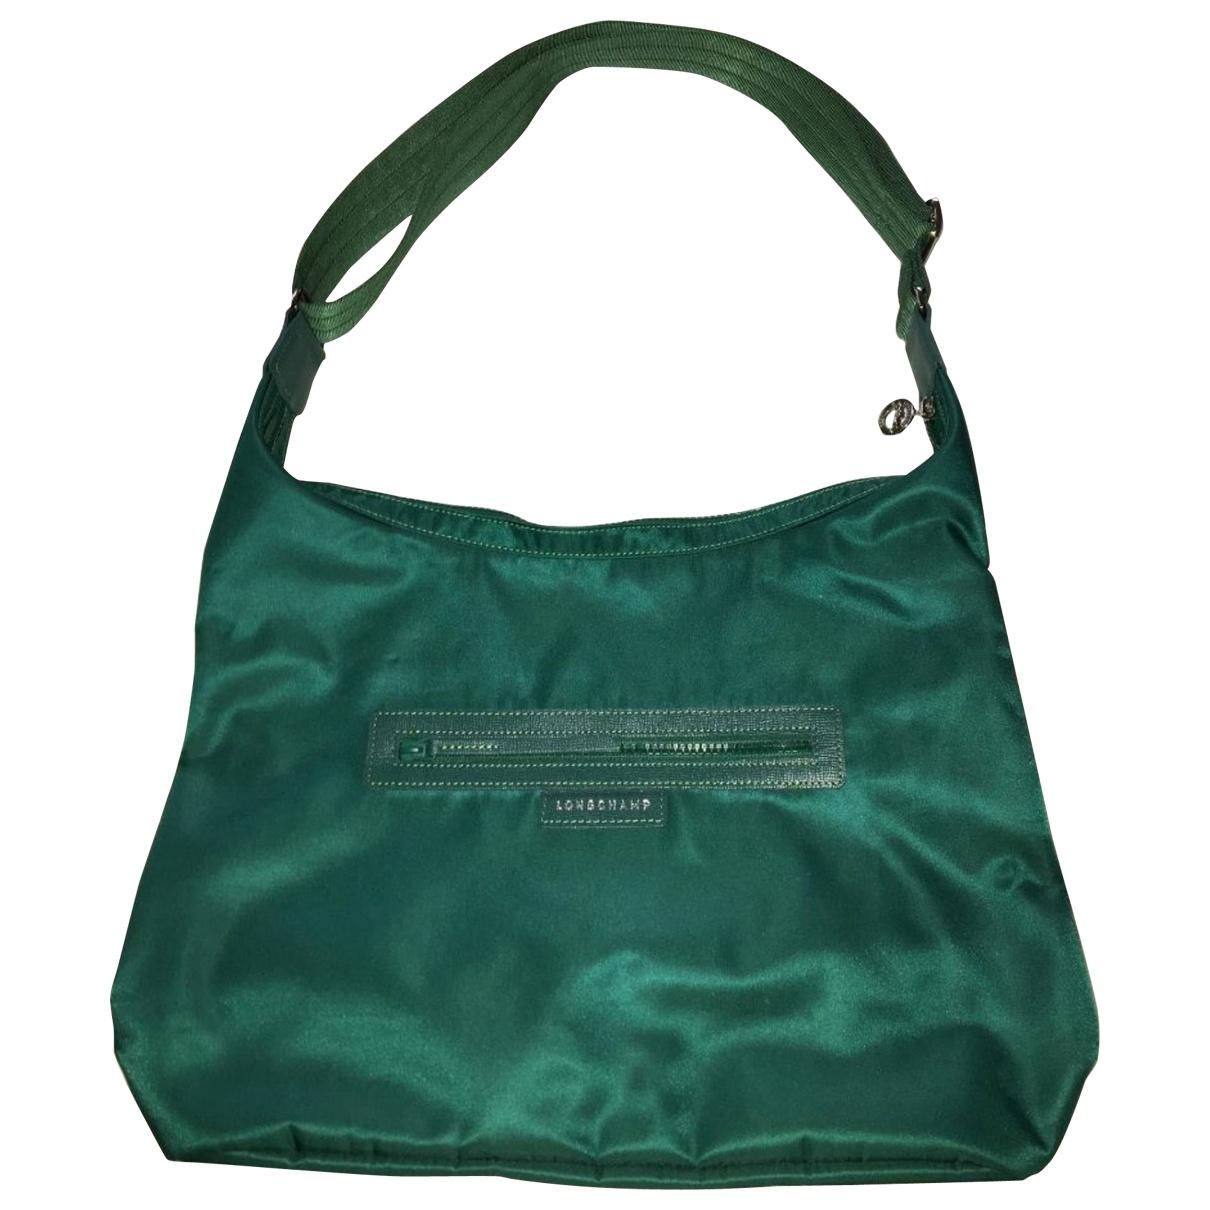 Longchamp \N Handtasche in  Gruen Leinen